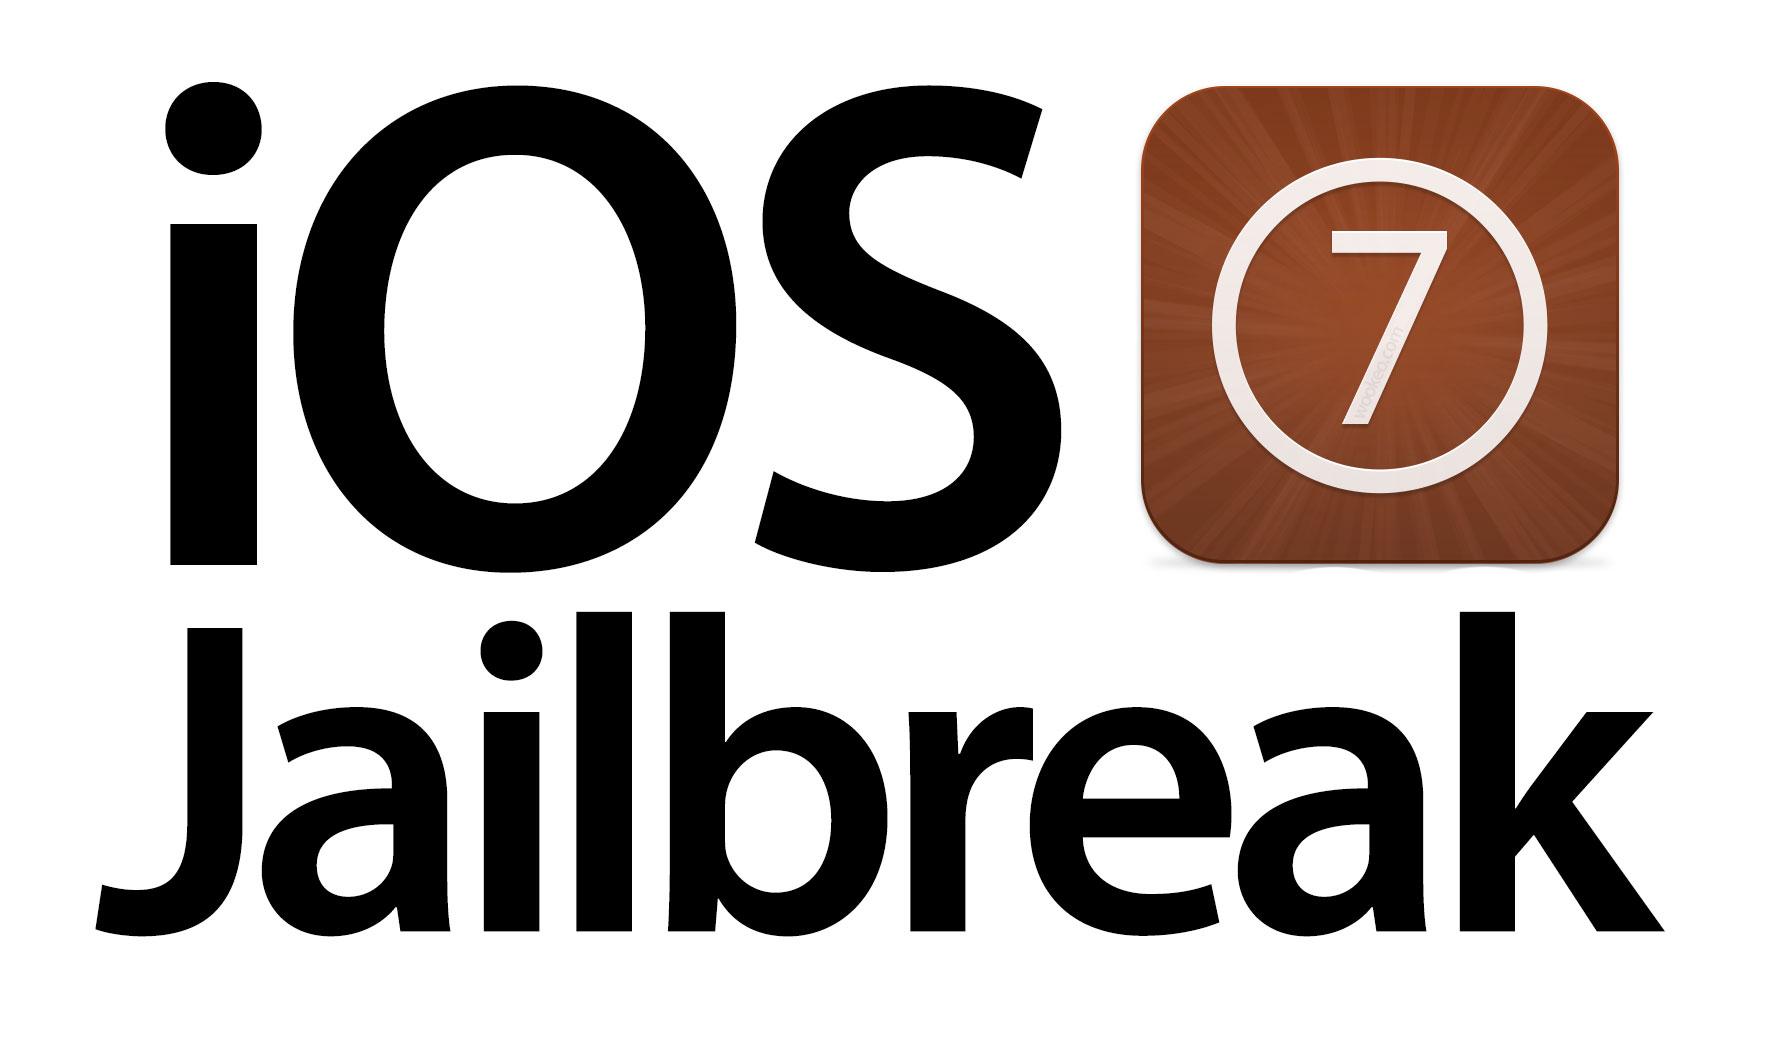 ios 7 jailbreak MuscleNerd déconseille de passer sous iOS 7.1 bêta